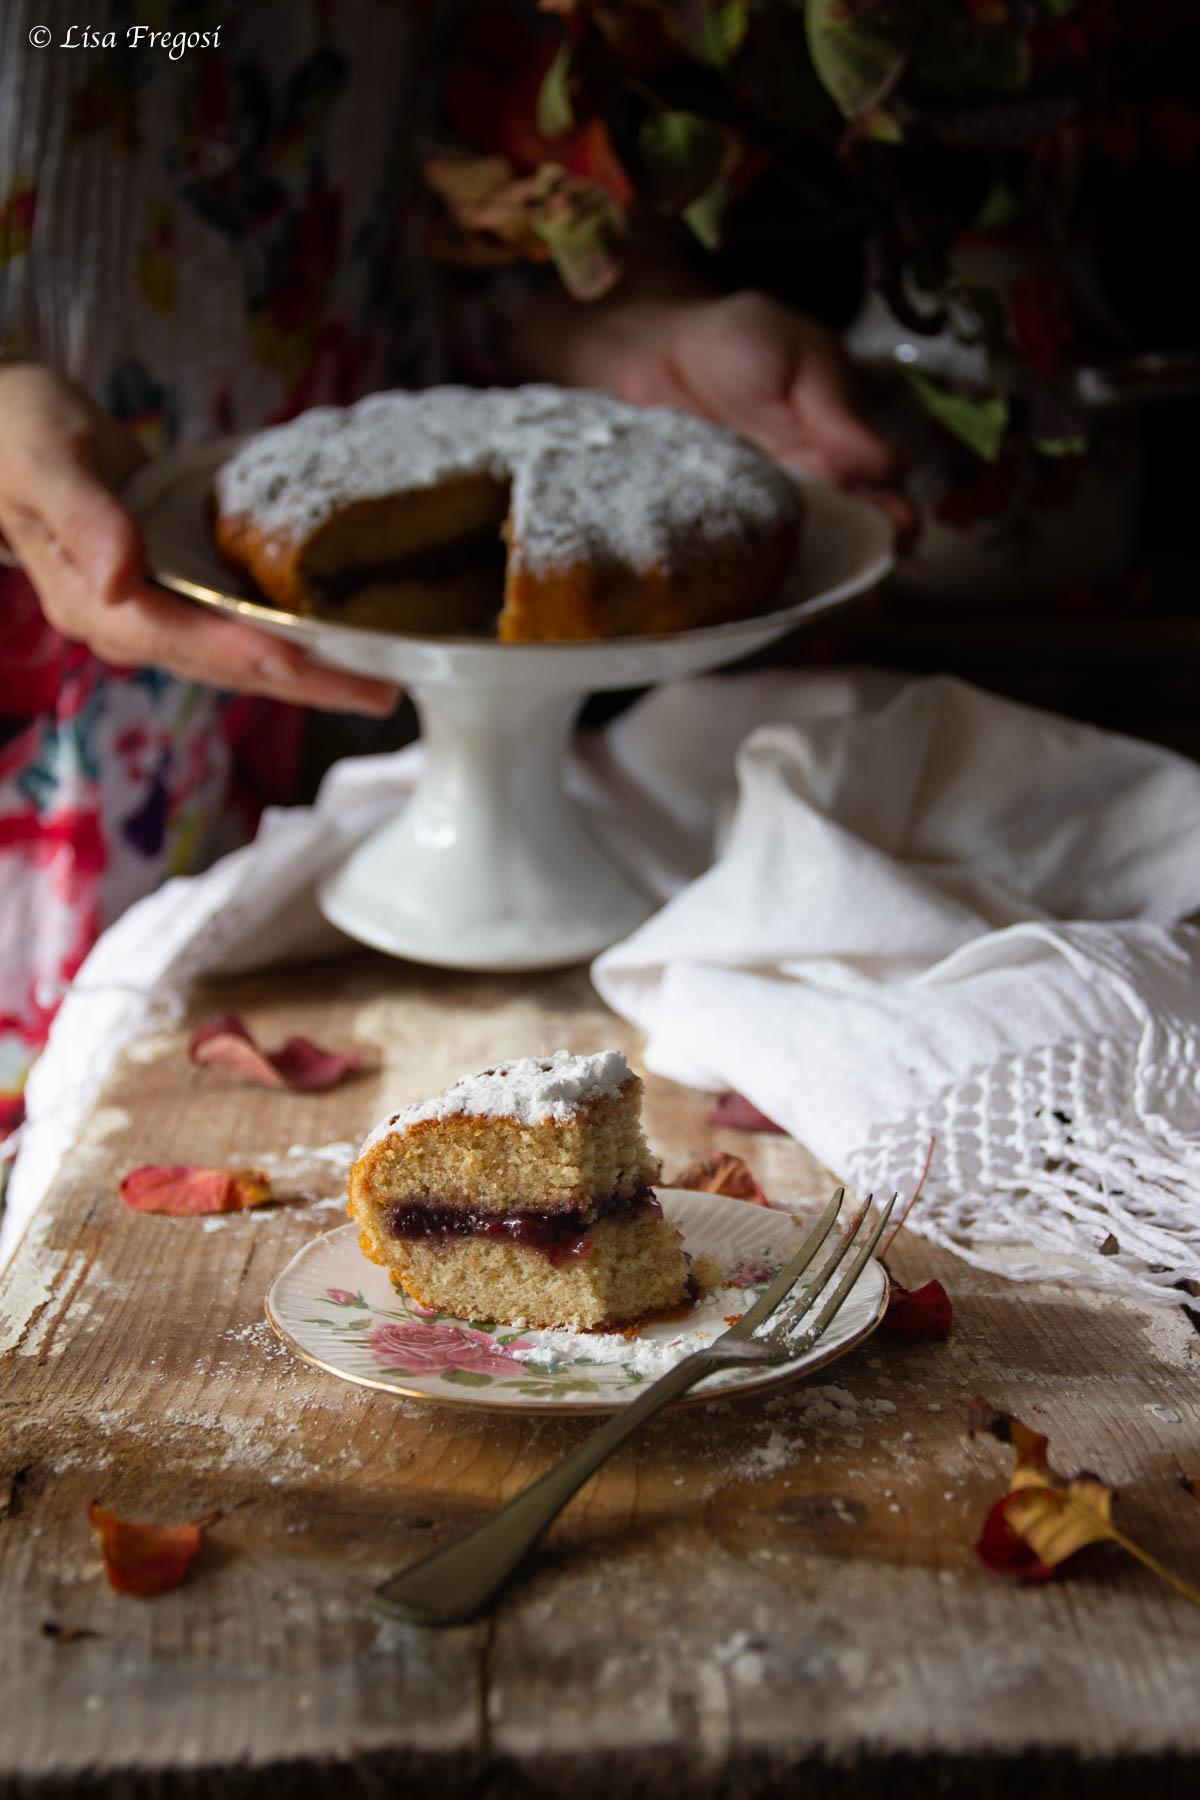 ricetta della torta versata